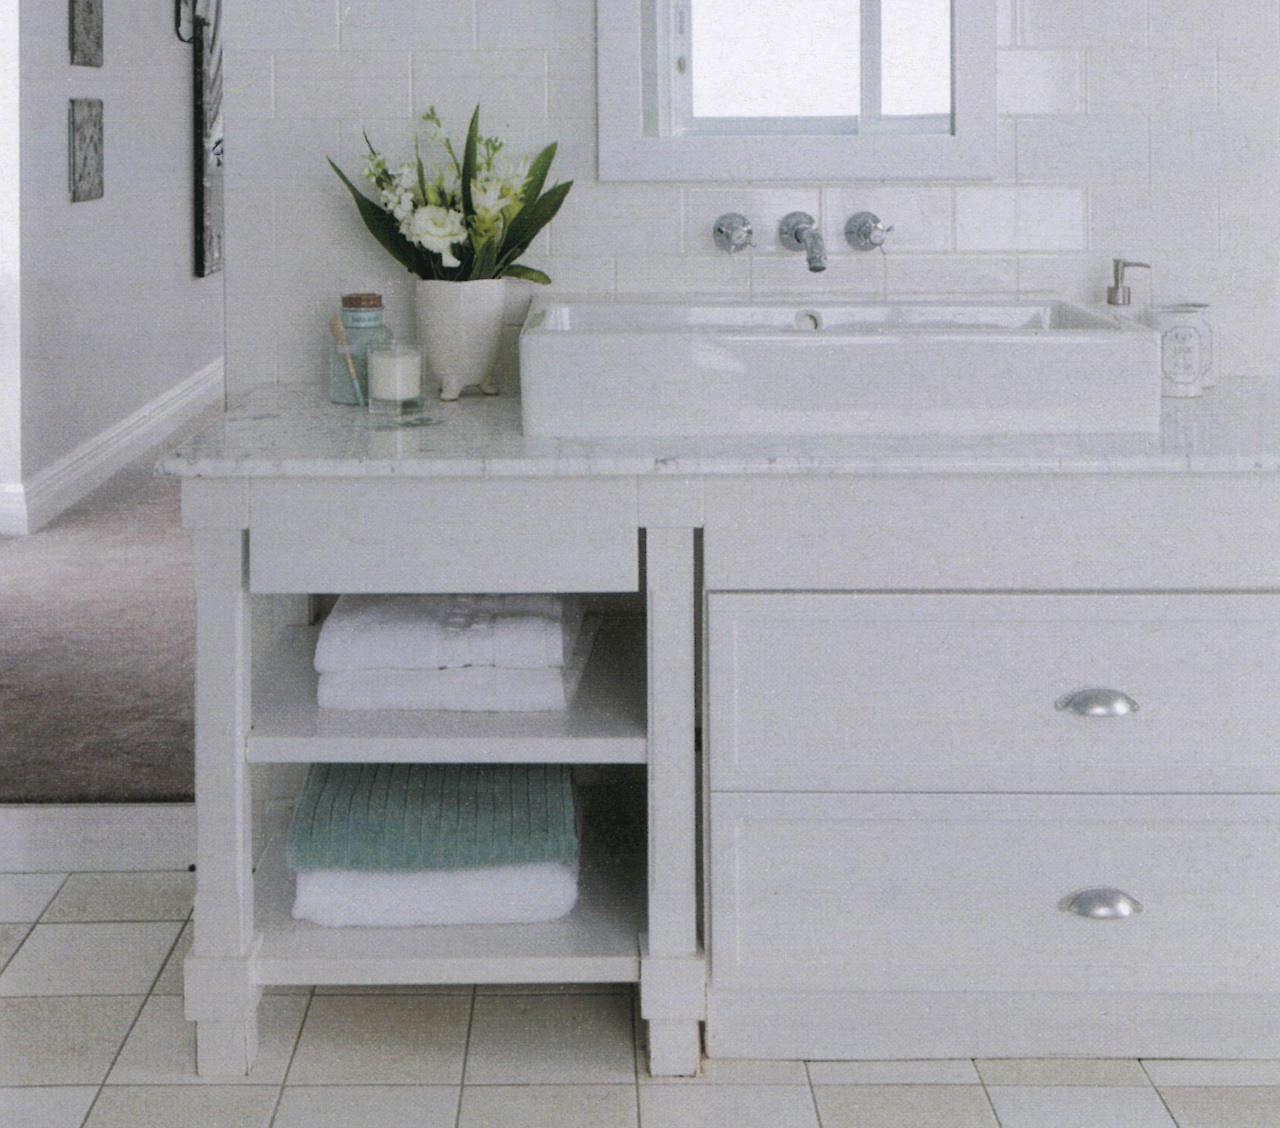 garden and home - Bathroom Ideas South Africa